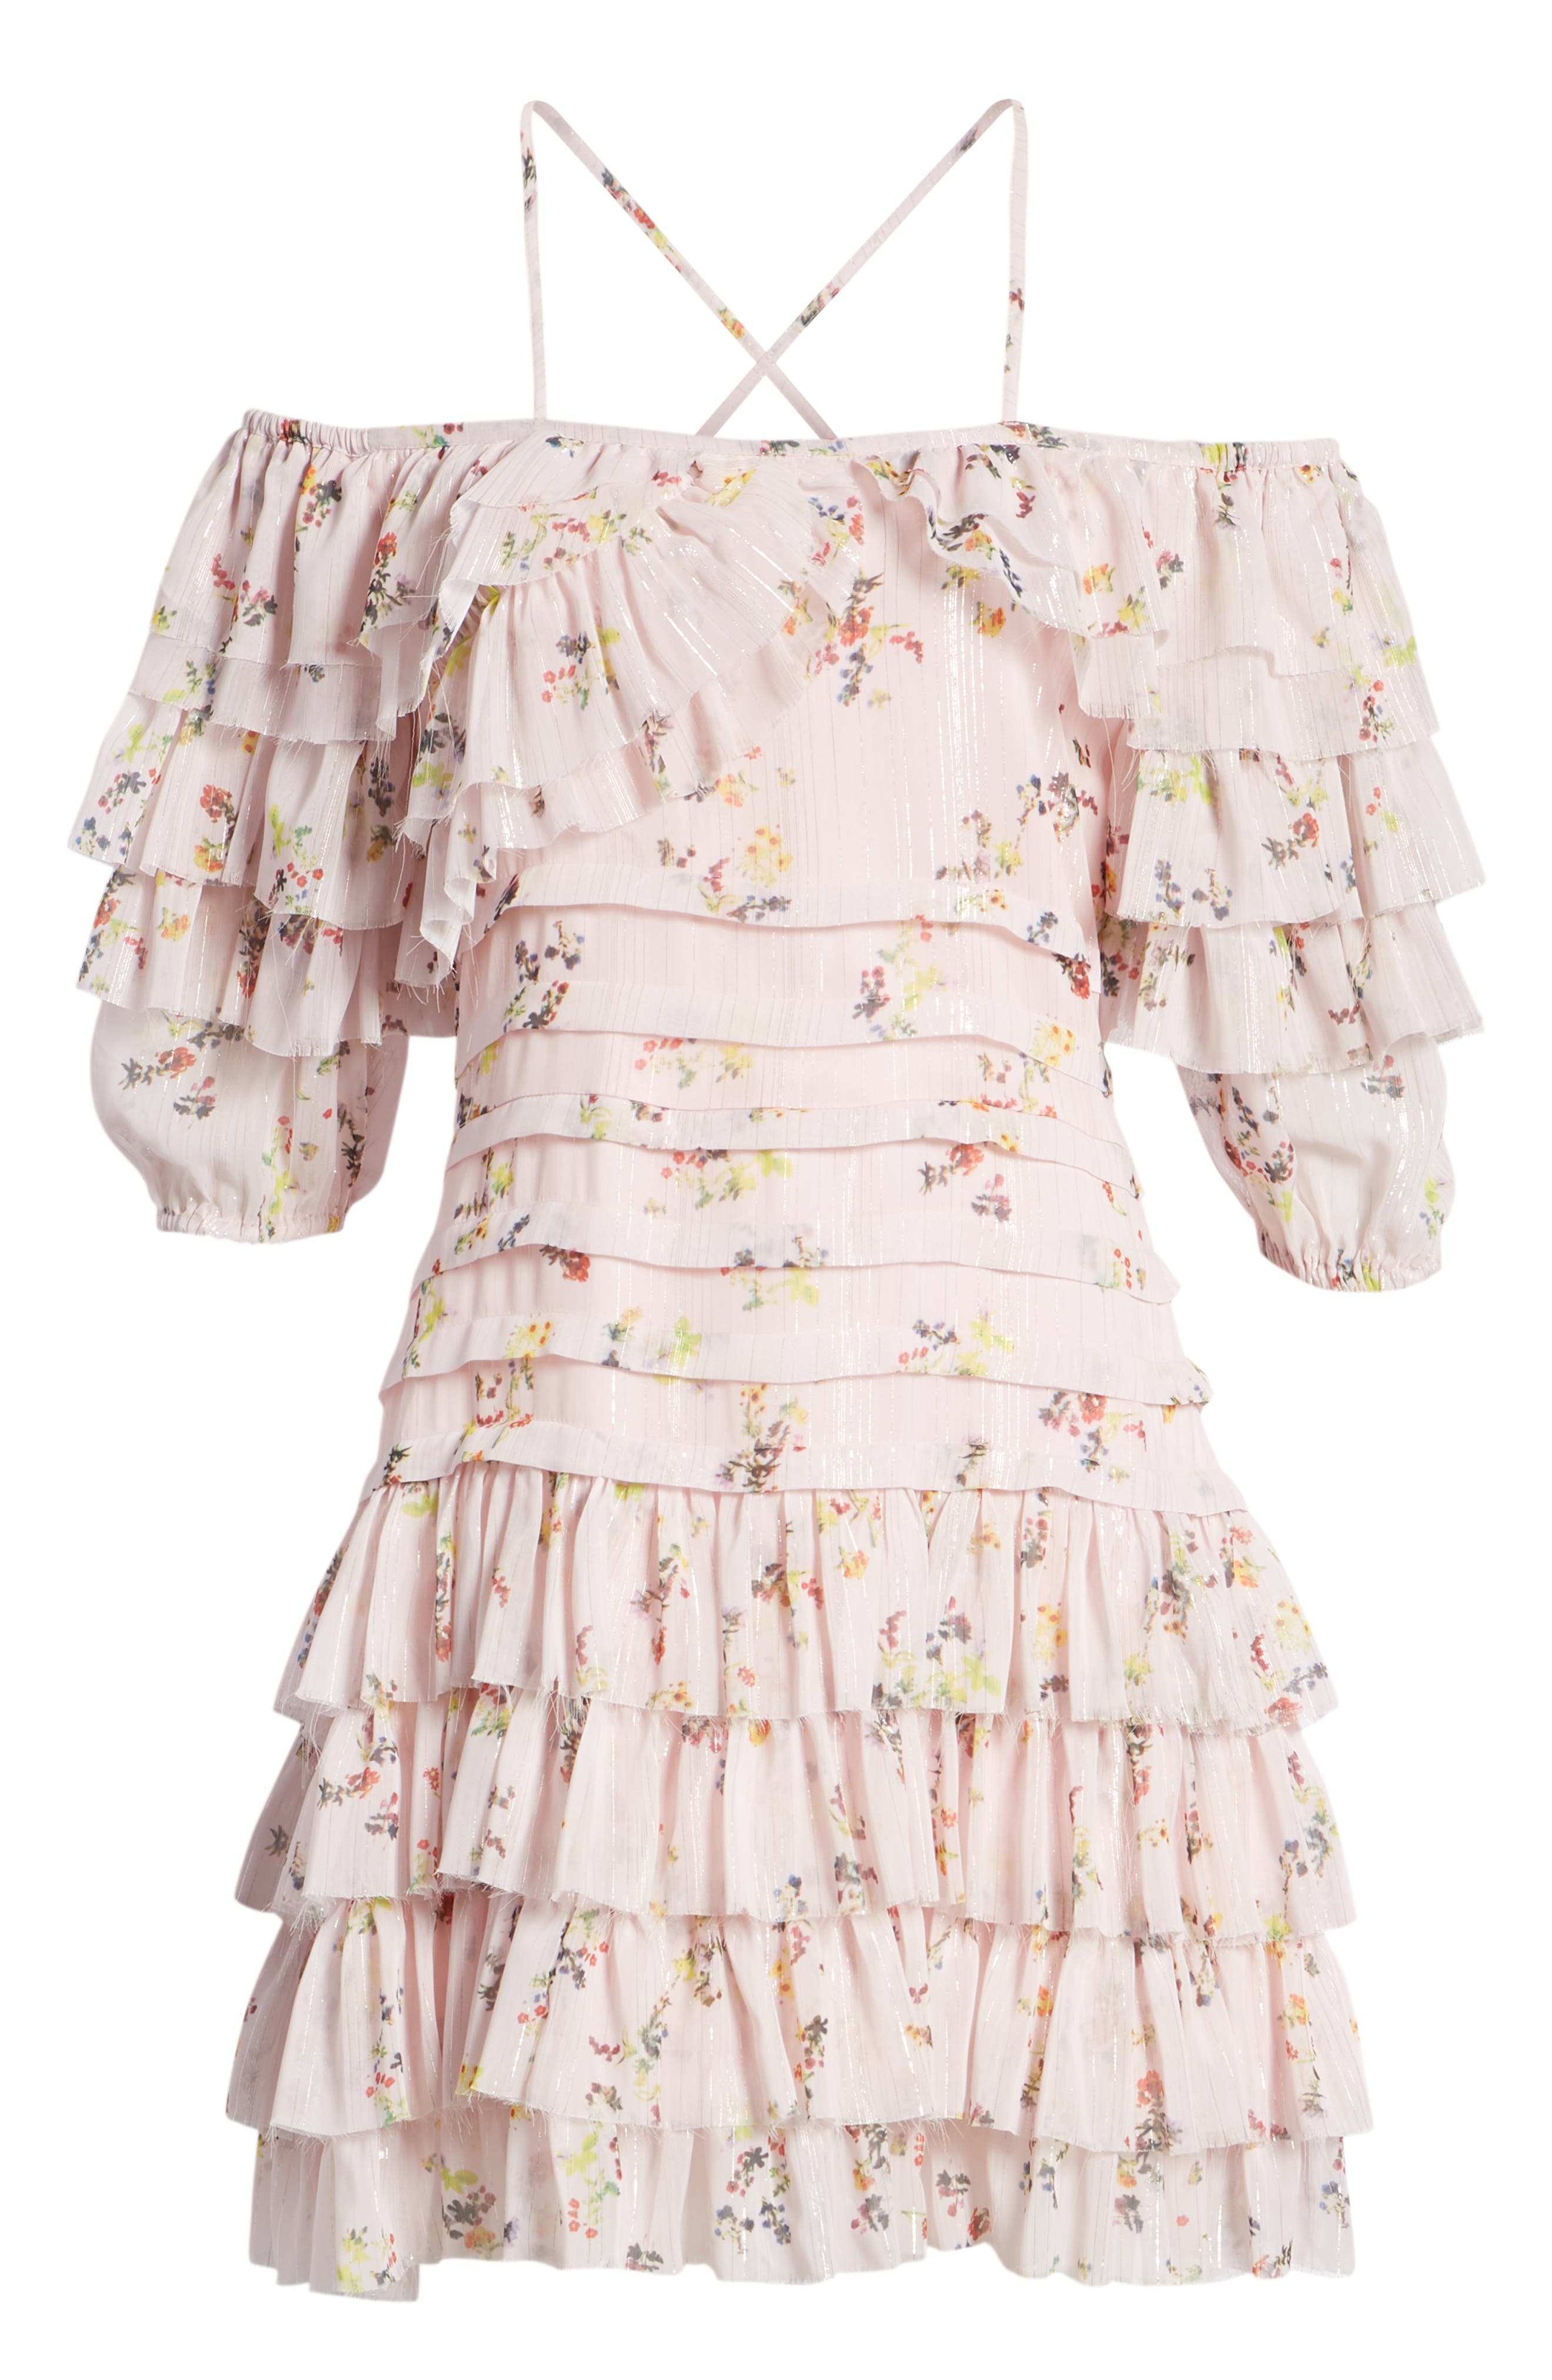 Mina Ruffled Cold Shoulder Dress,                             Alternate thumbnail 7, color,                             Multi